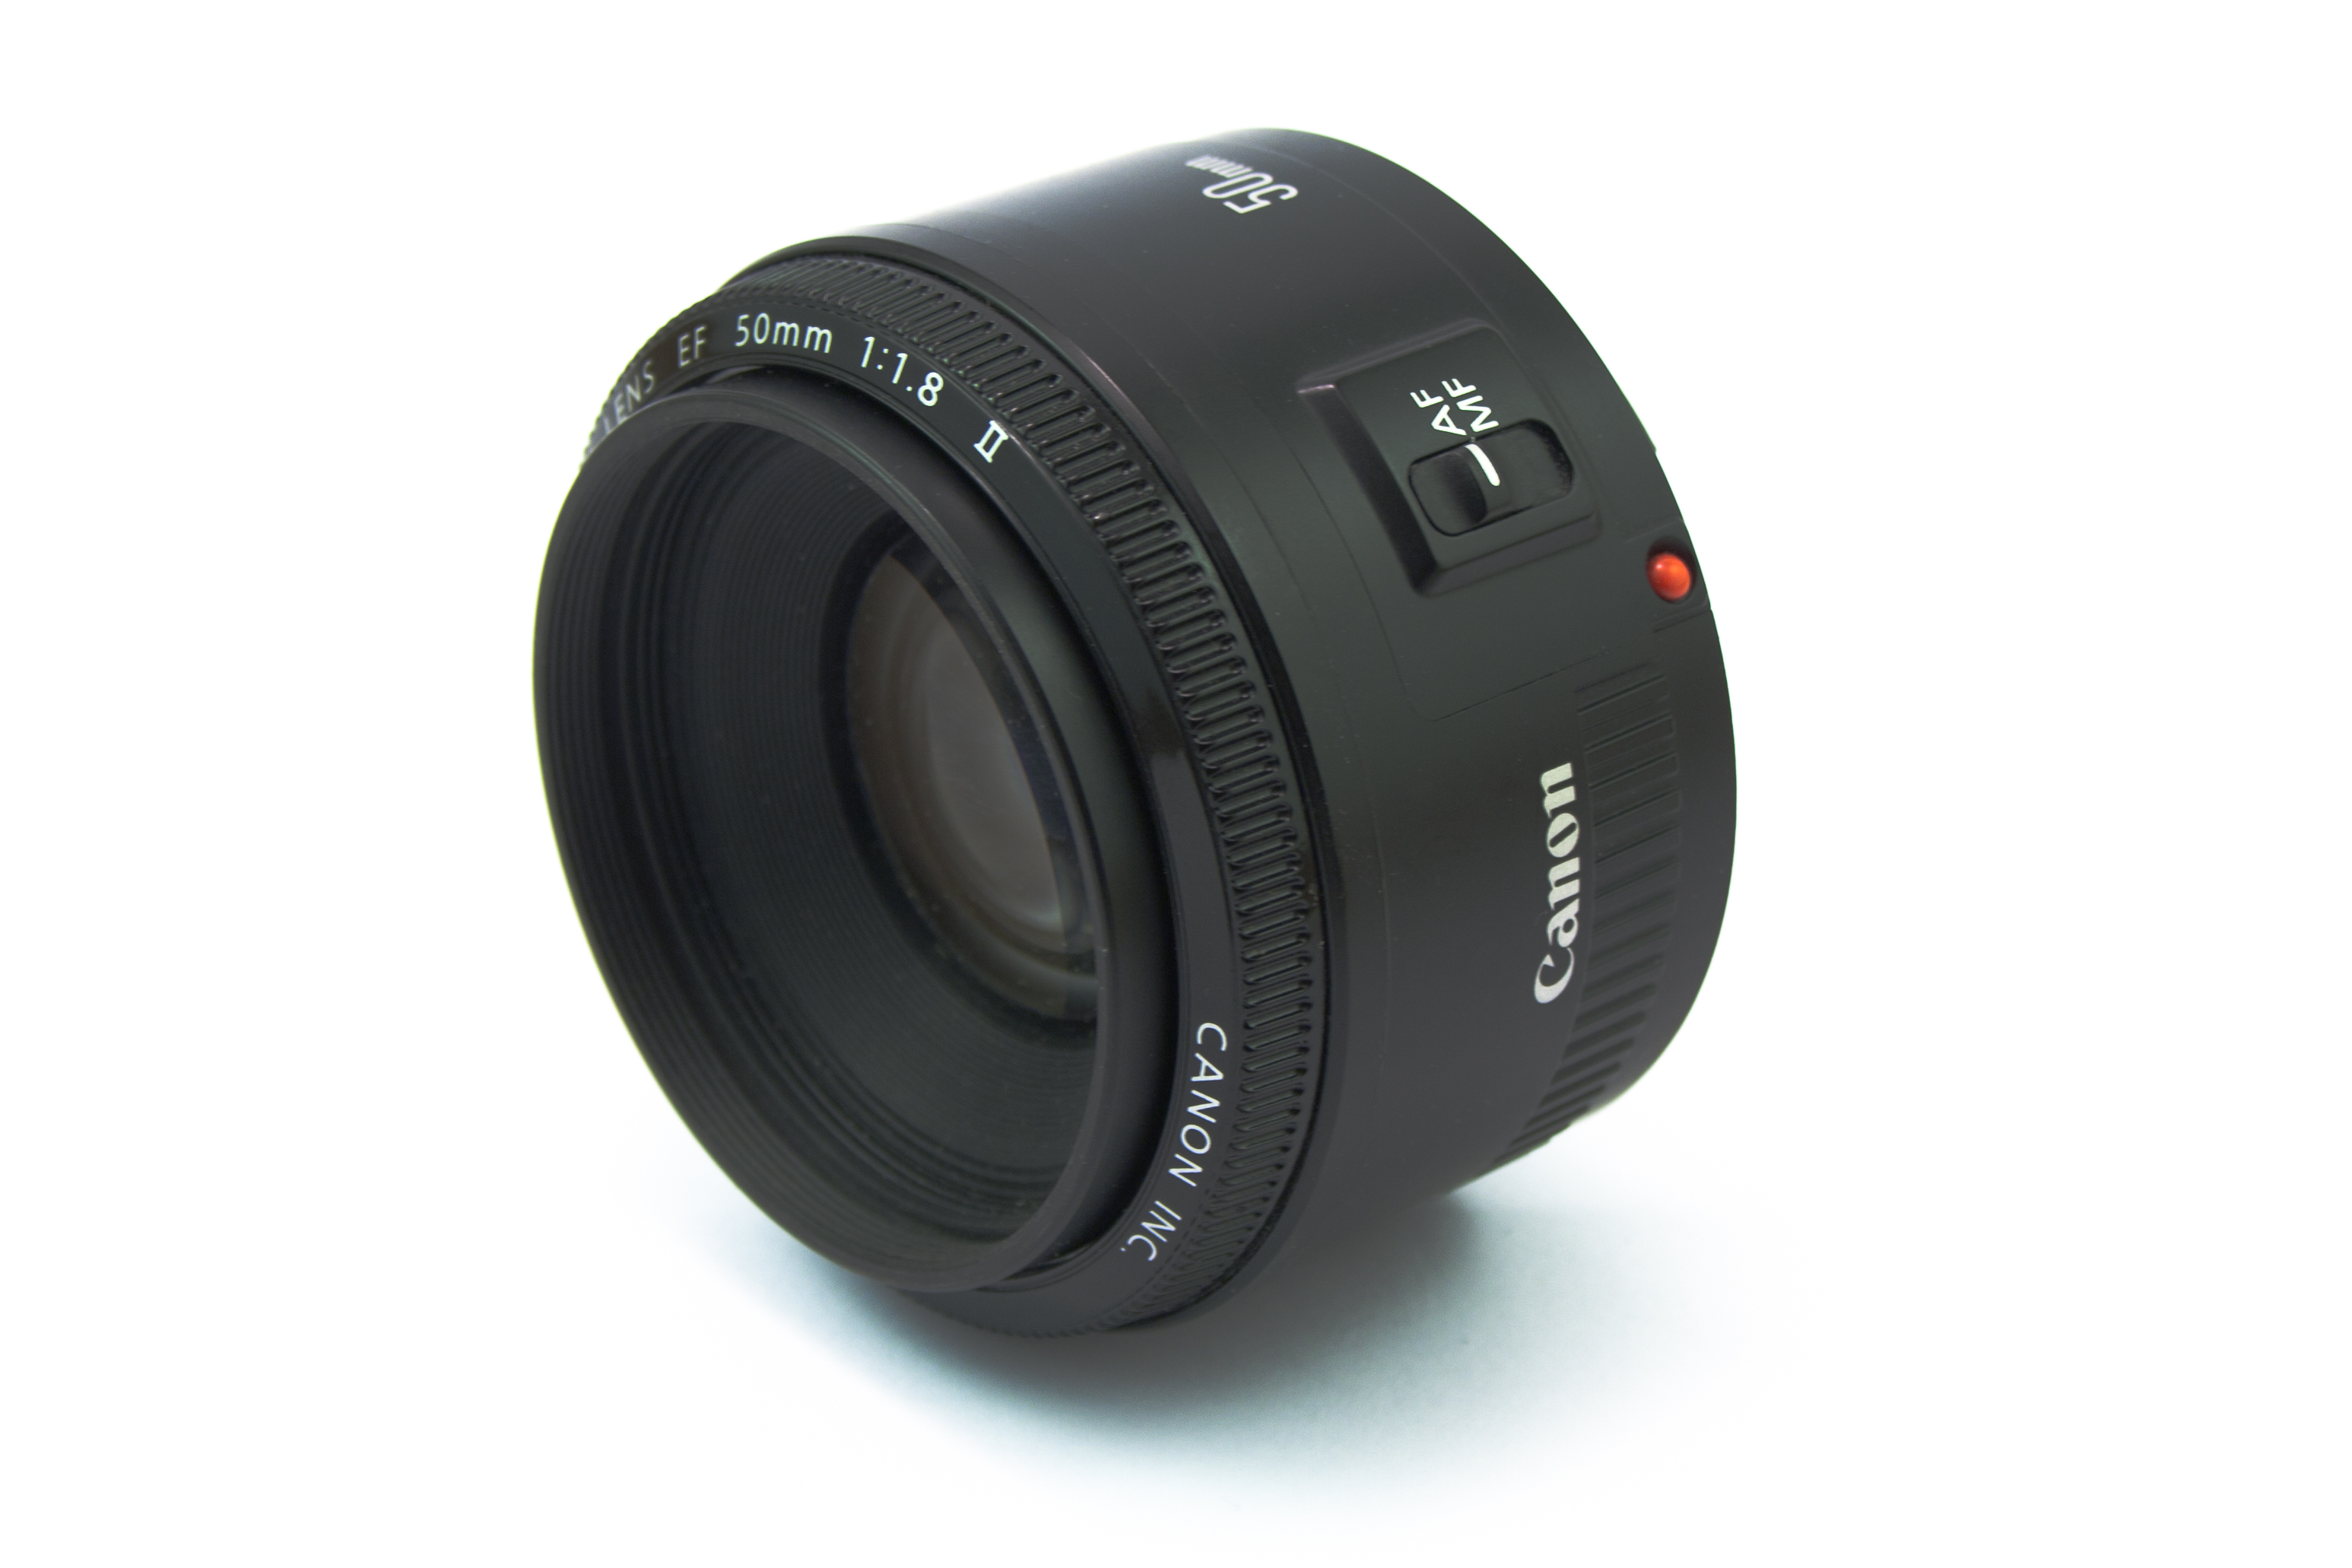 canon 50mmf1.8